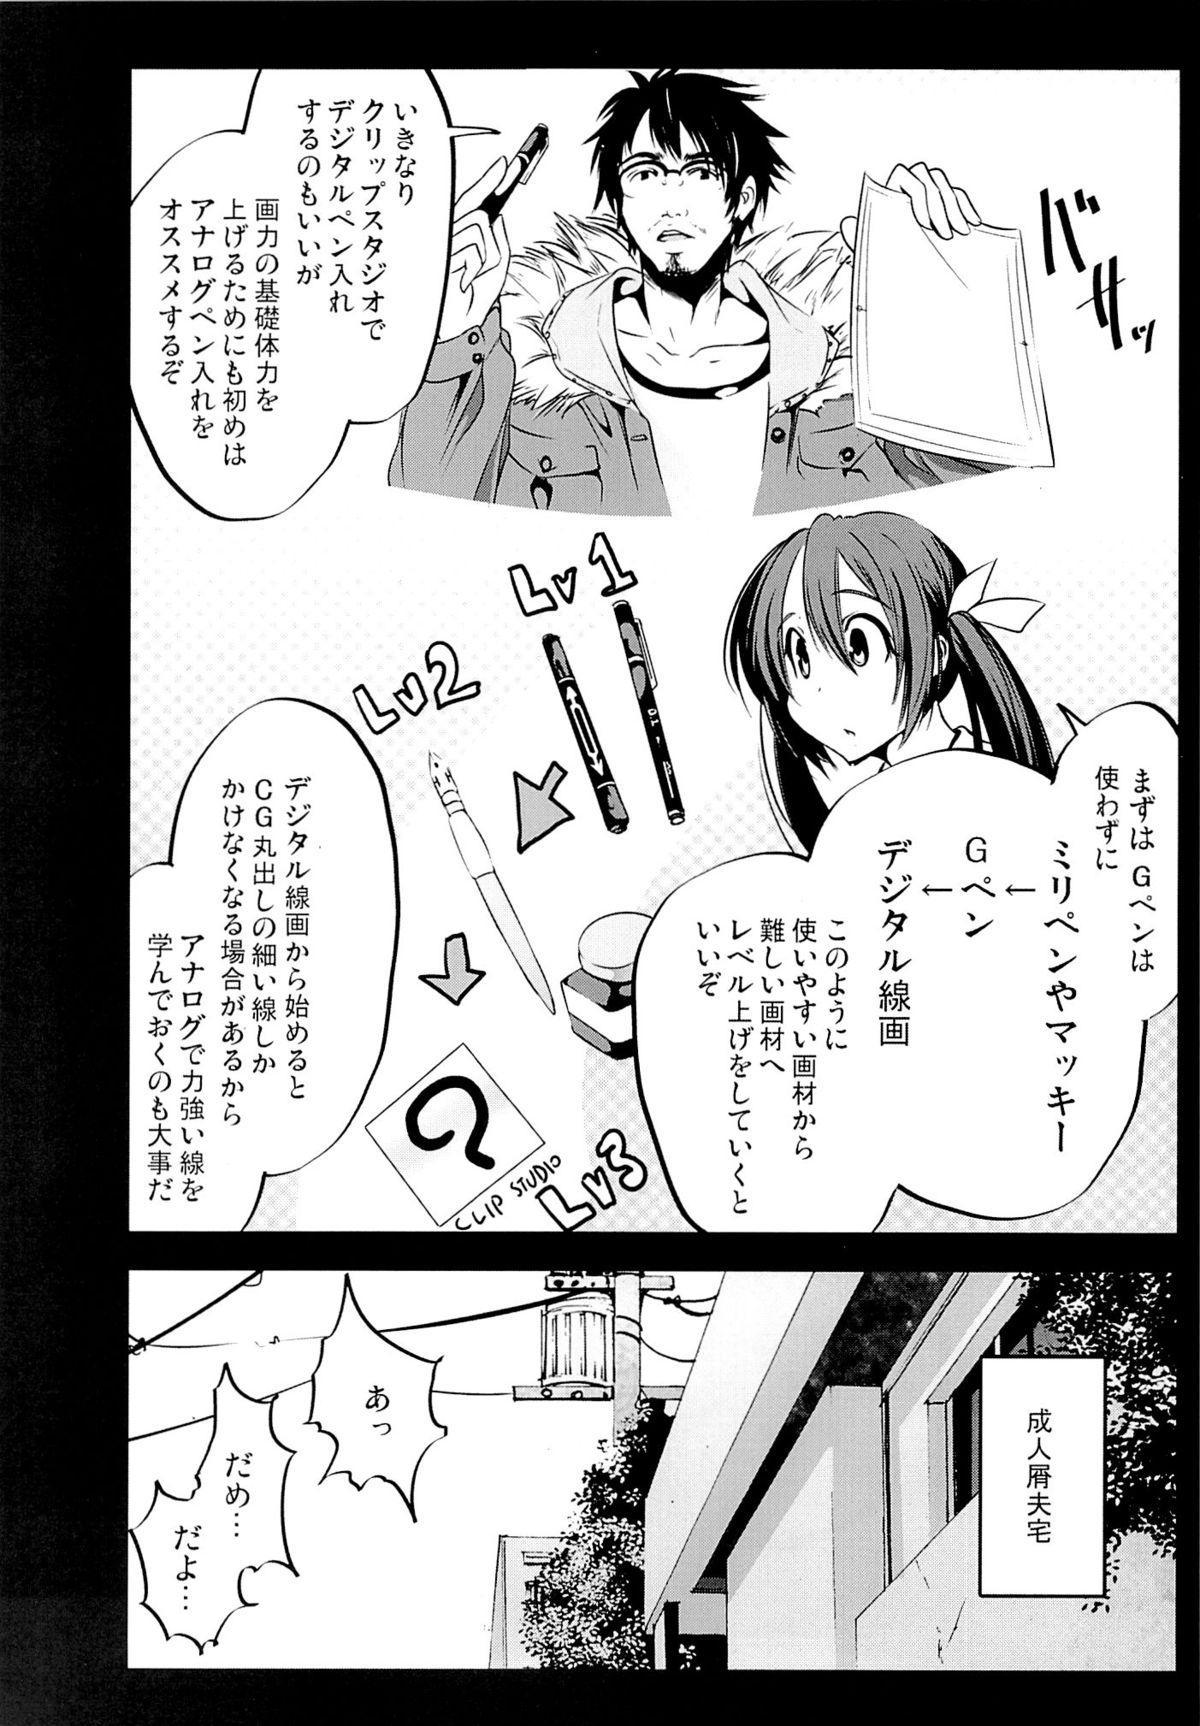 H na Doujinshi no Kakikata 18